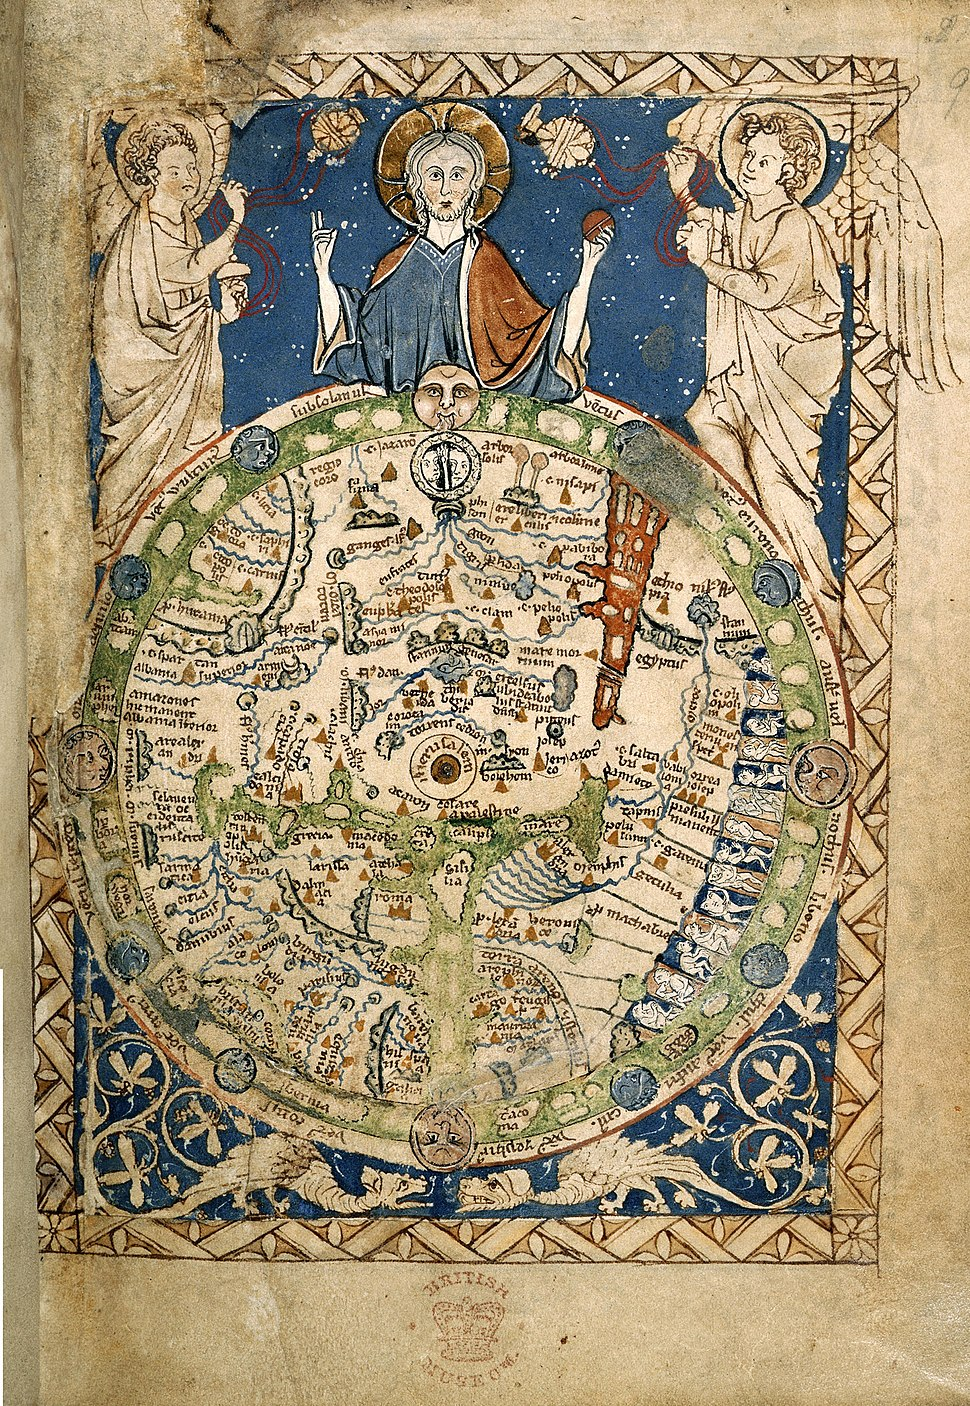 Psalter World Map, c.1265